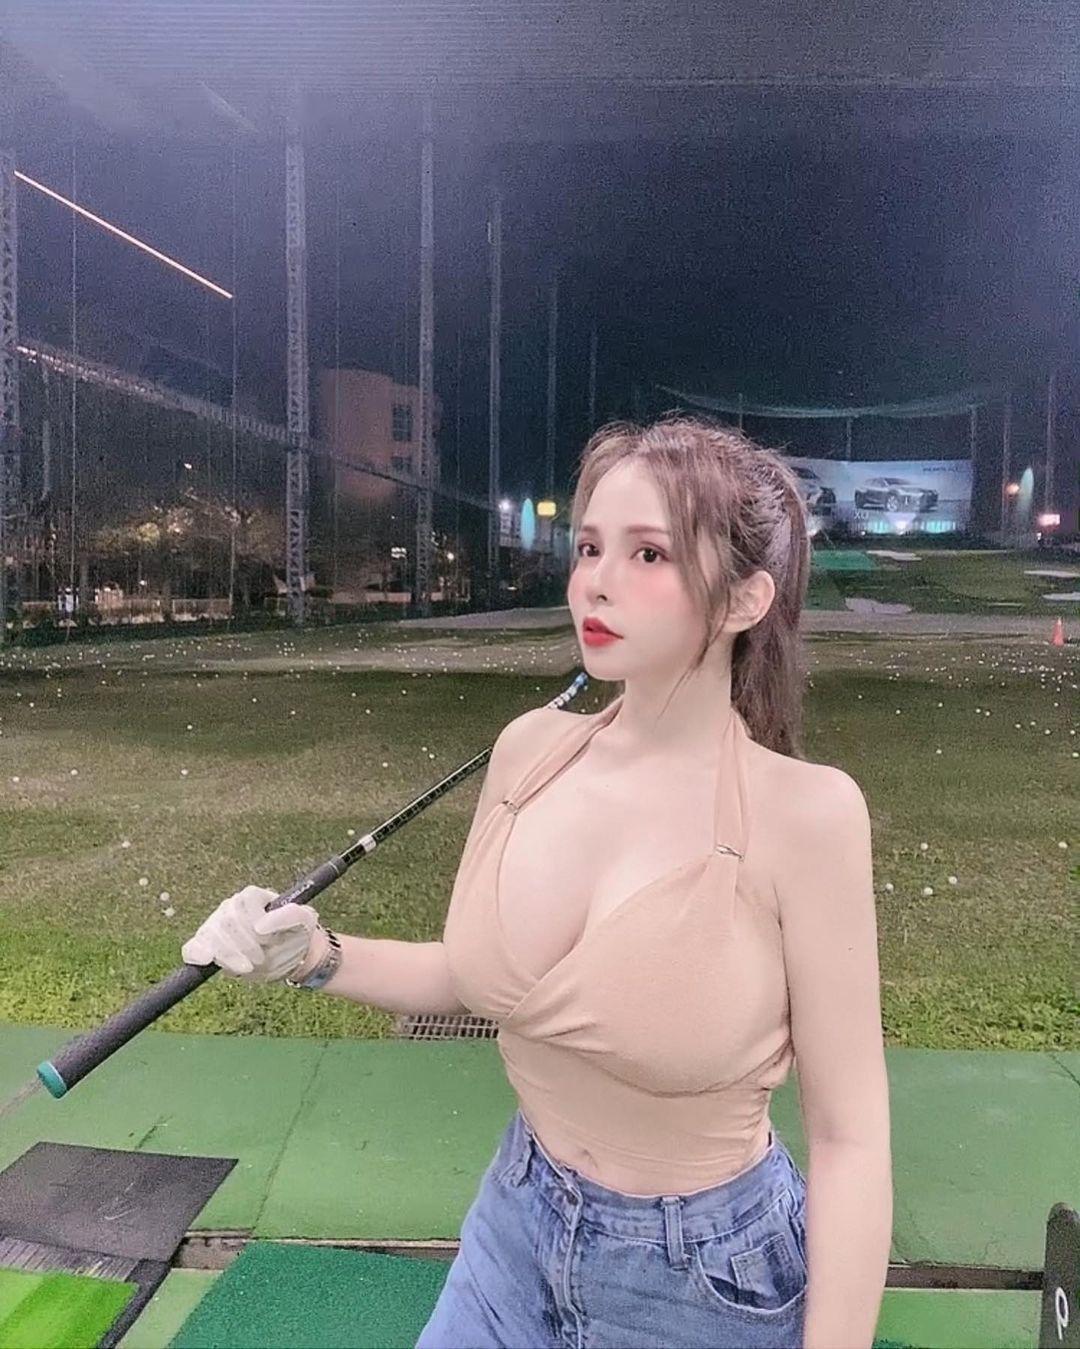 Mandi香菱打高尔夫,挥杆画面让人浮想联翩 发现美